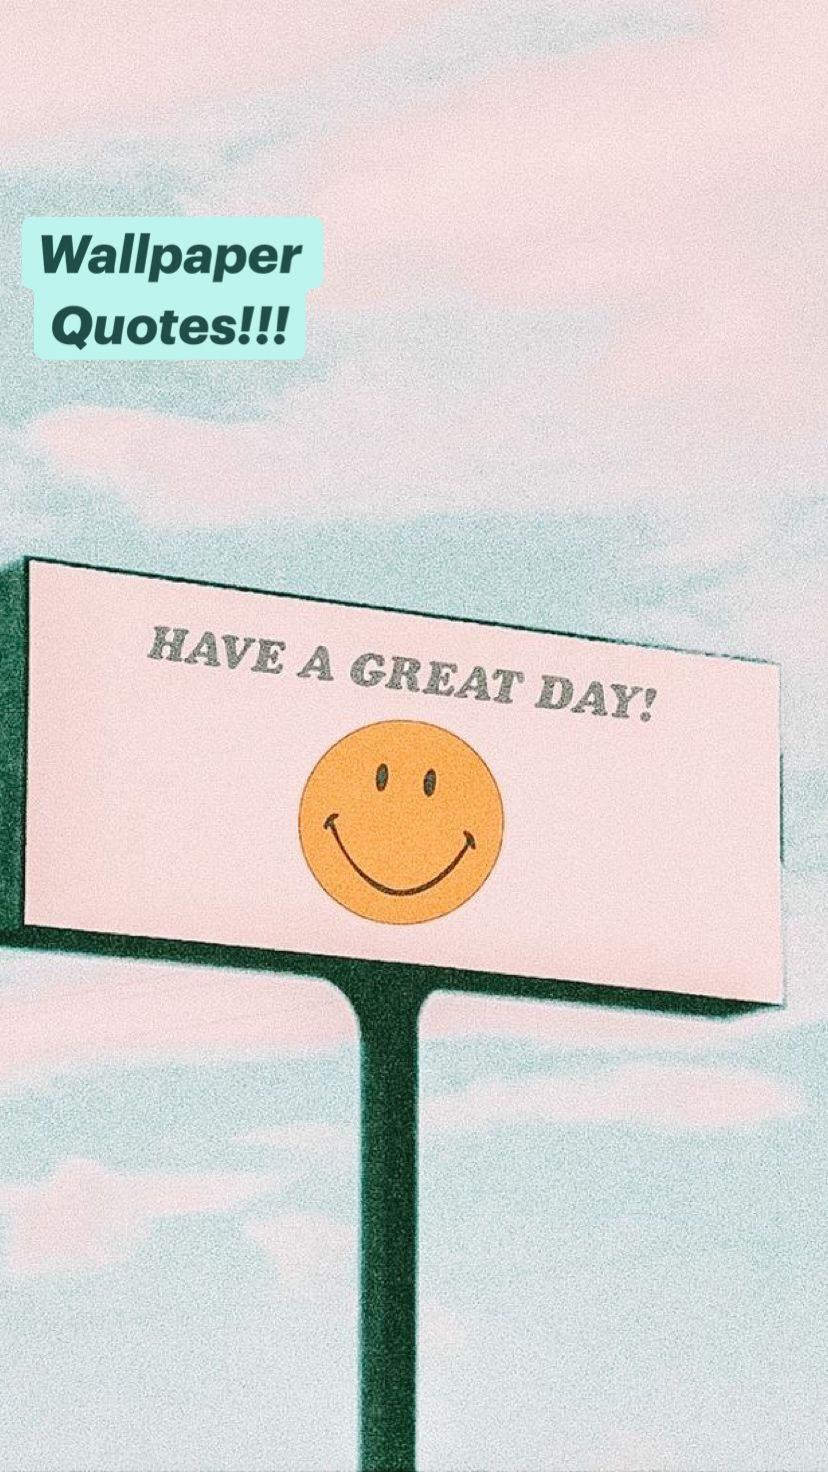 Wallpaper Quotes!!!